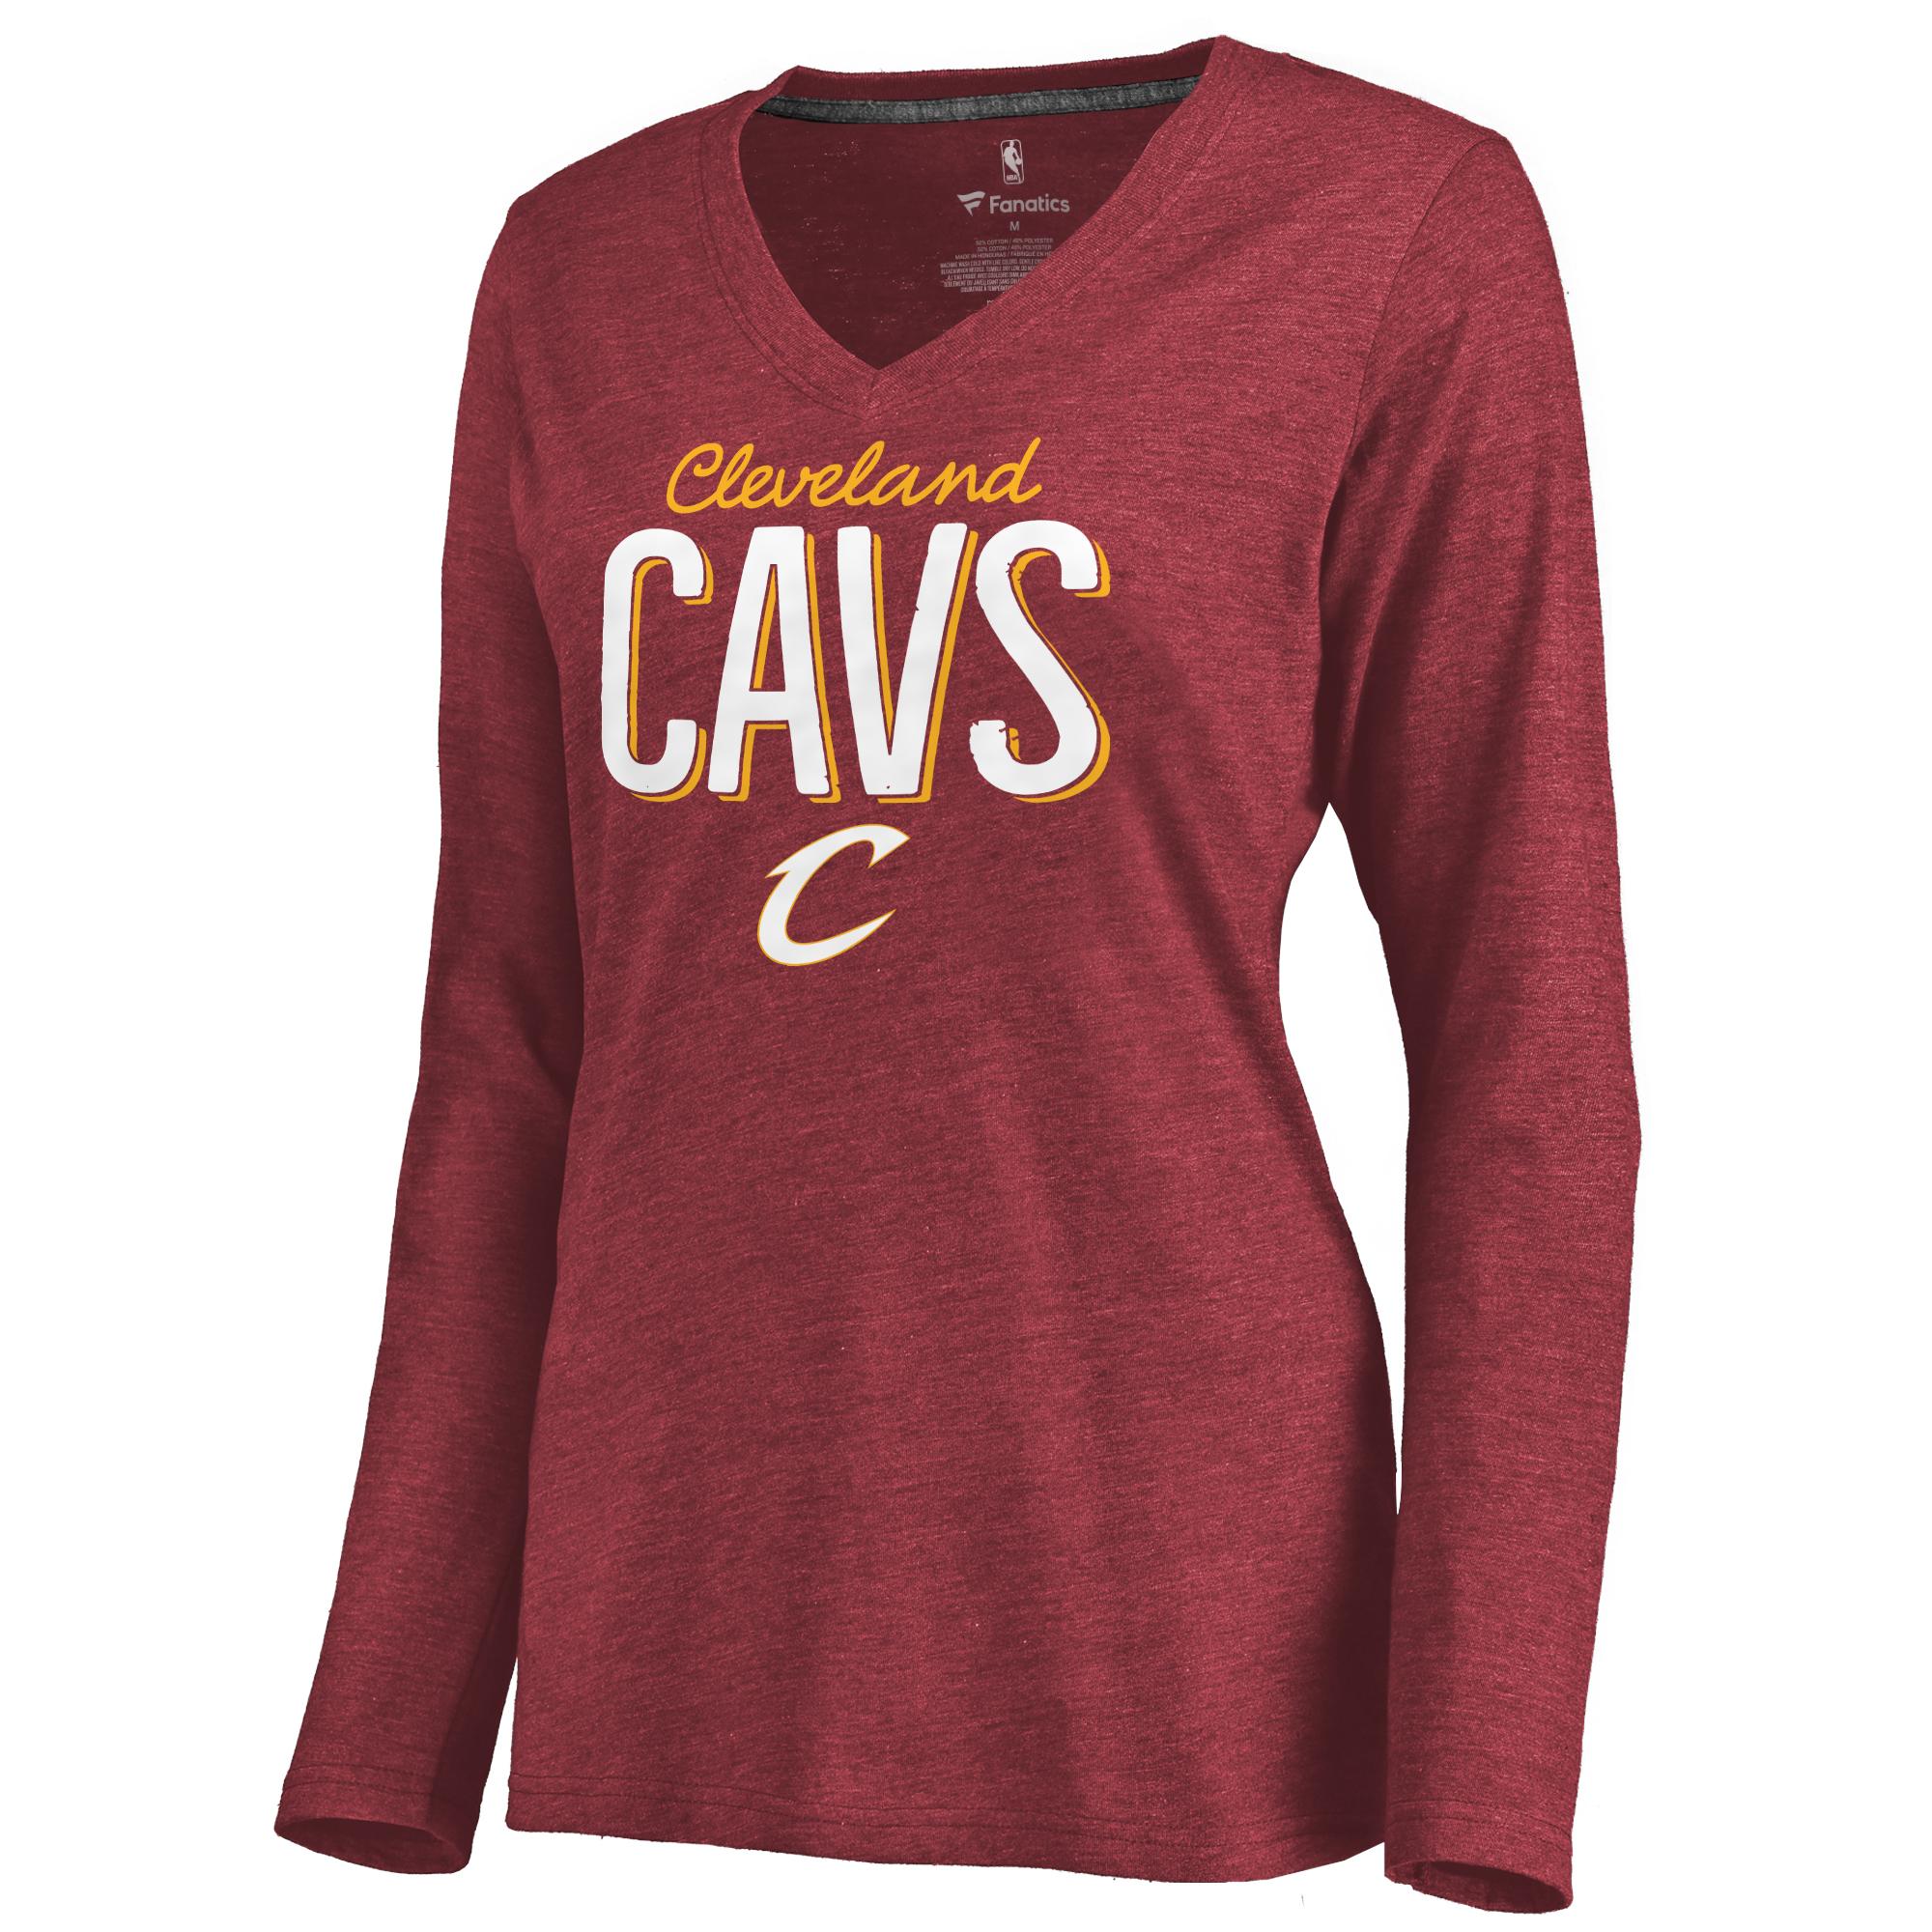 Cleveland Cavaliers Women's Nostalgia Long Sleeve Tri-Blend V-Neck T-Shirt - Garnet